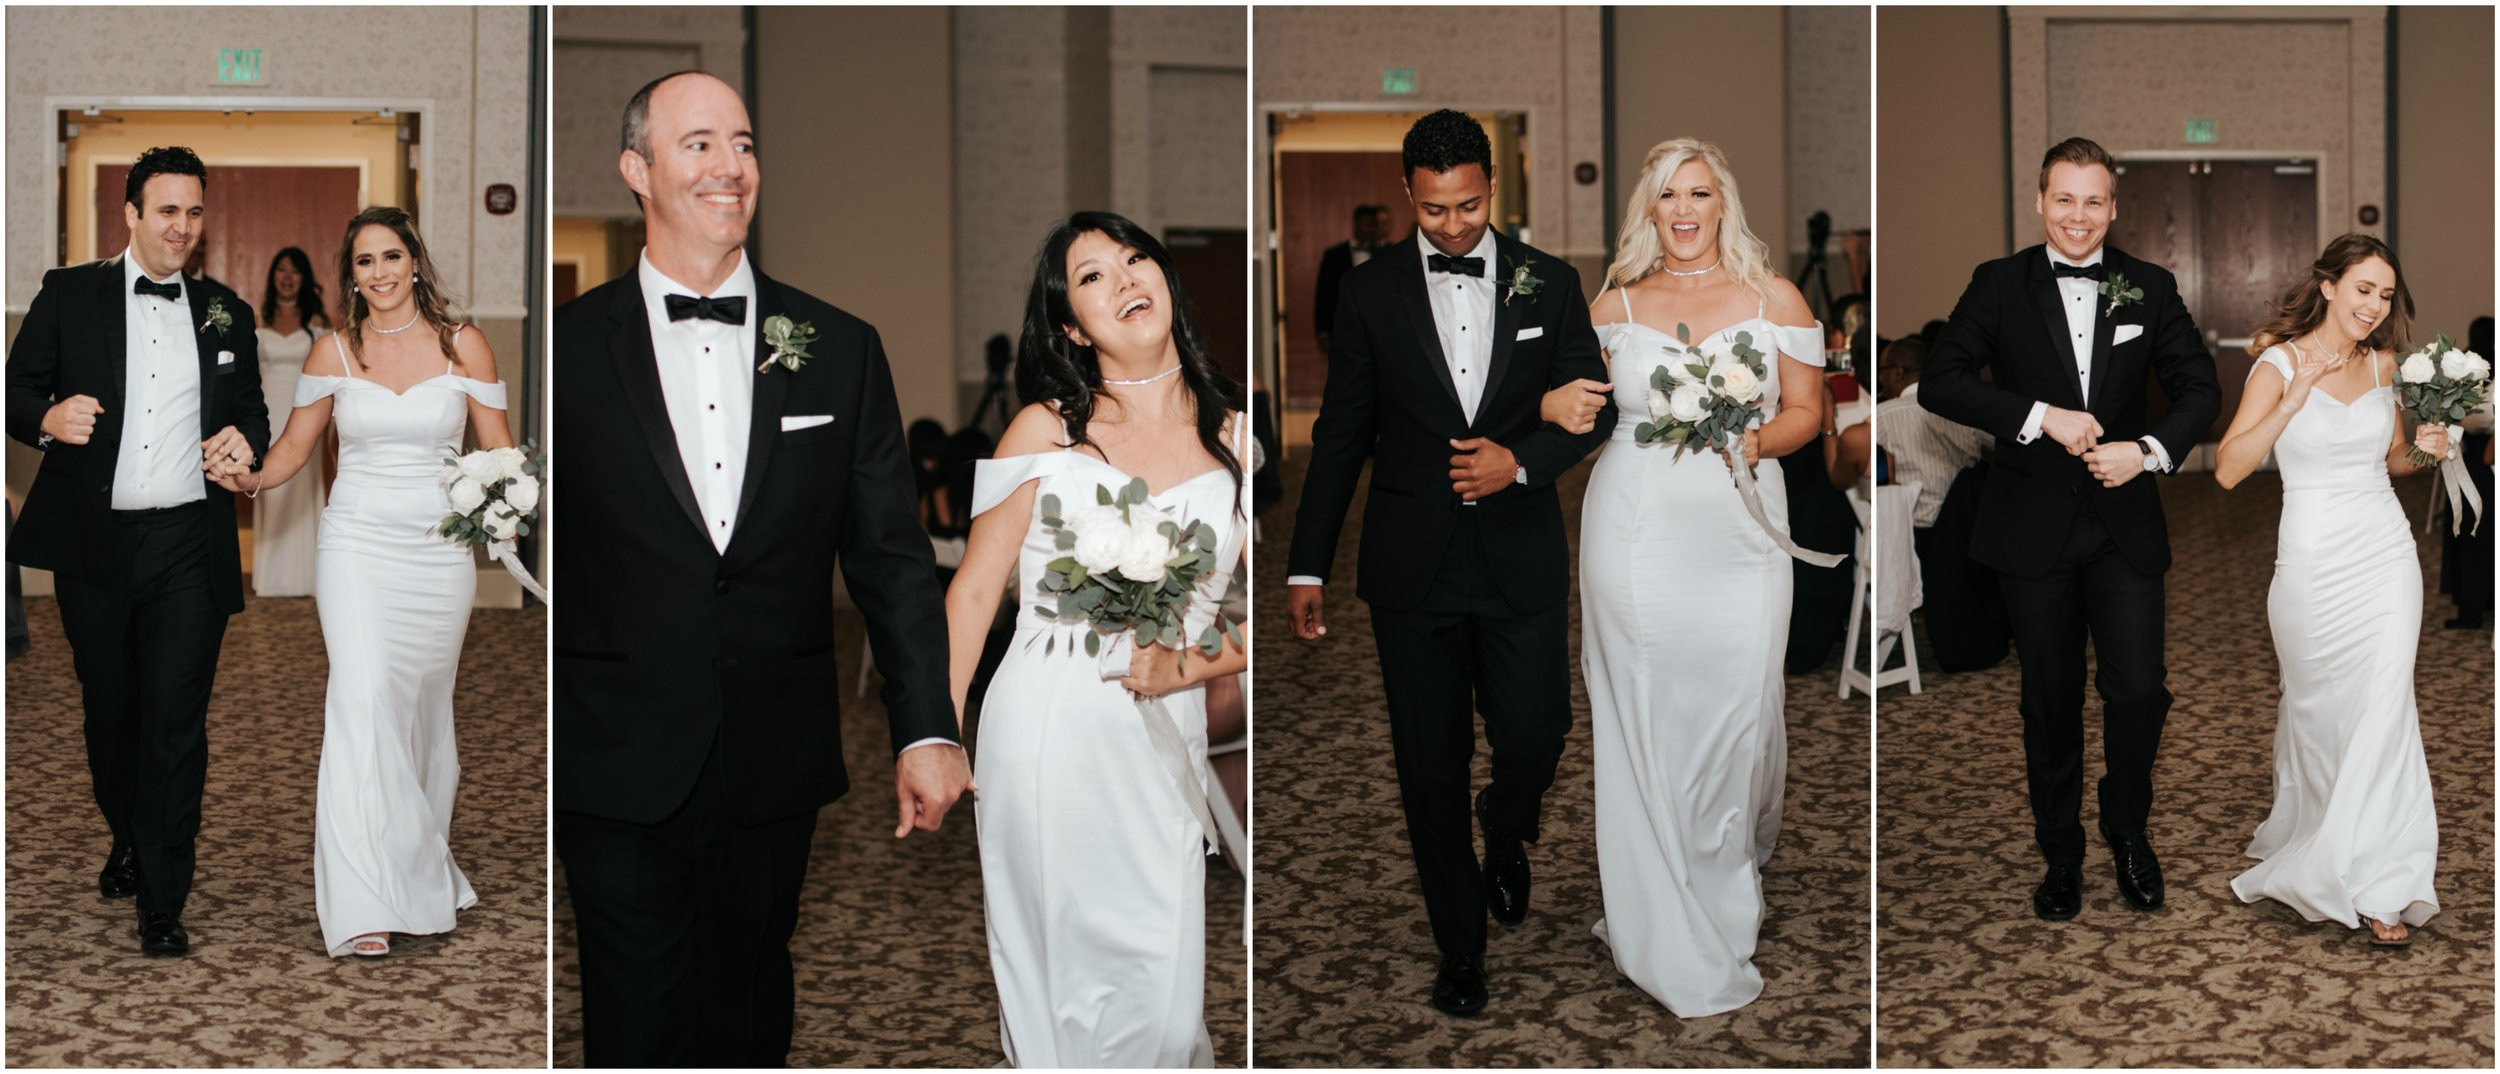 taylor-miguel-wedding-lake-mary-bridal-party-intros.jpg